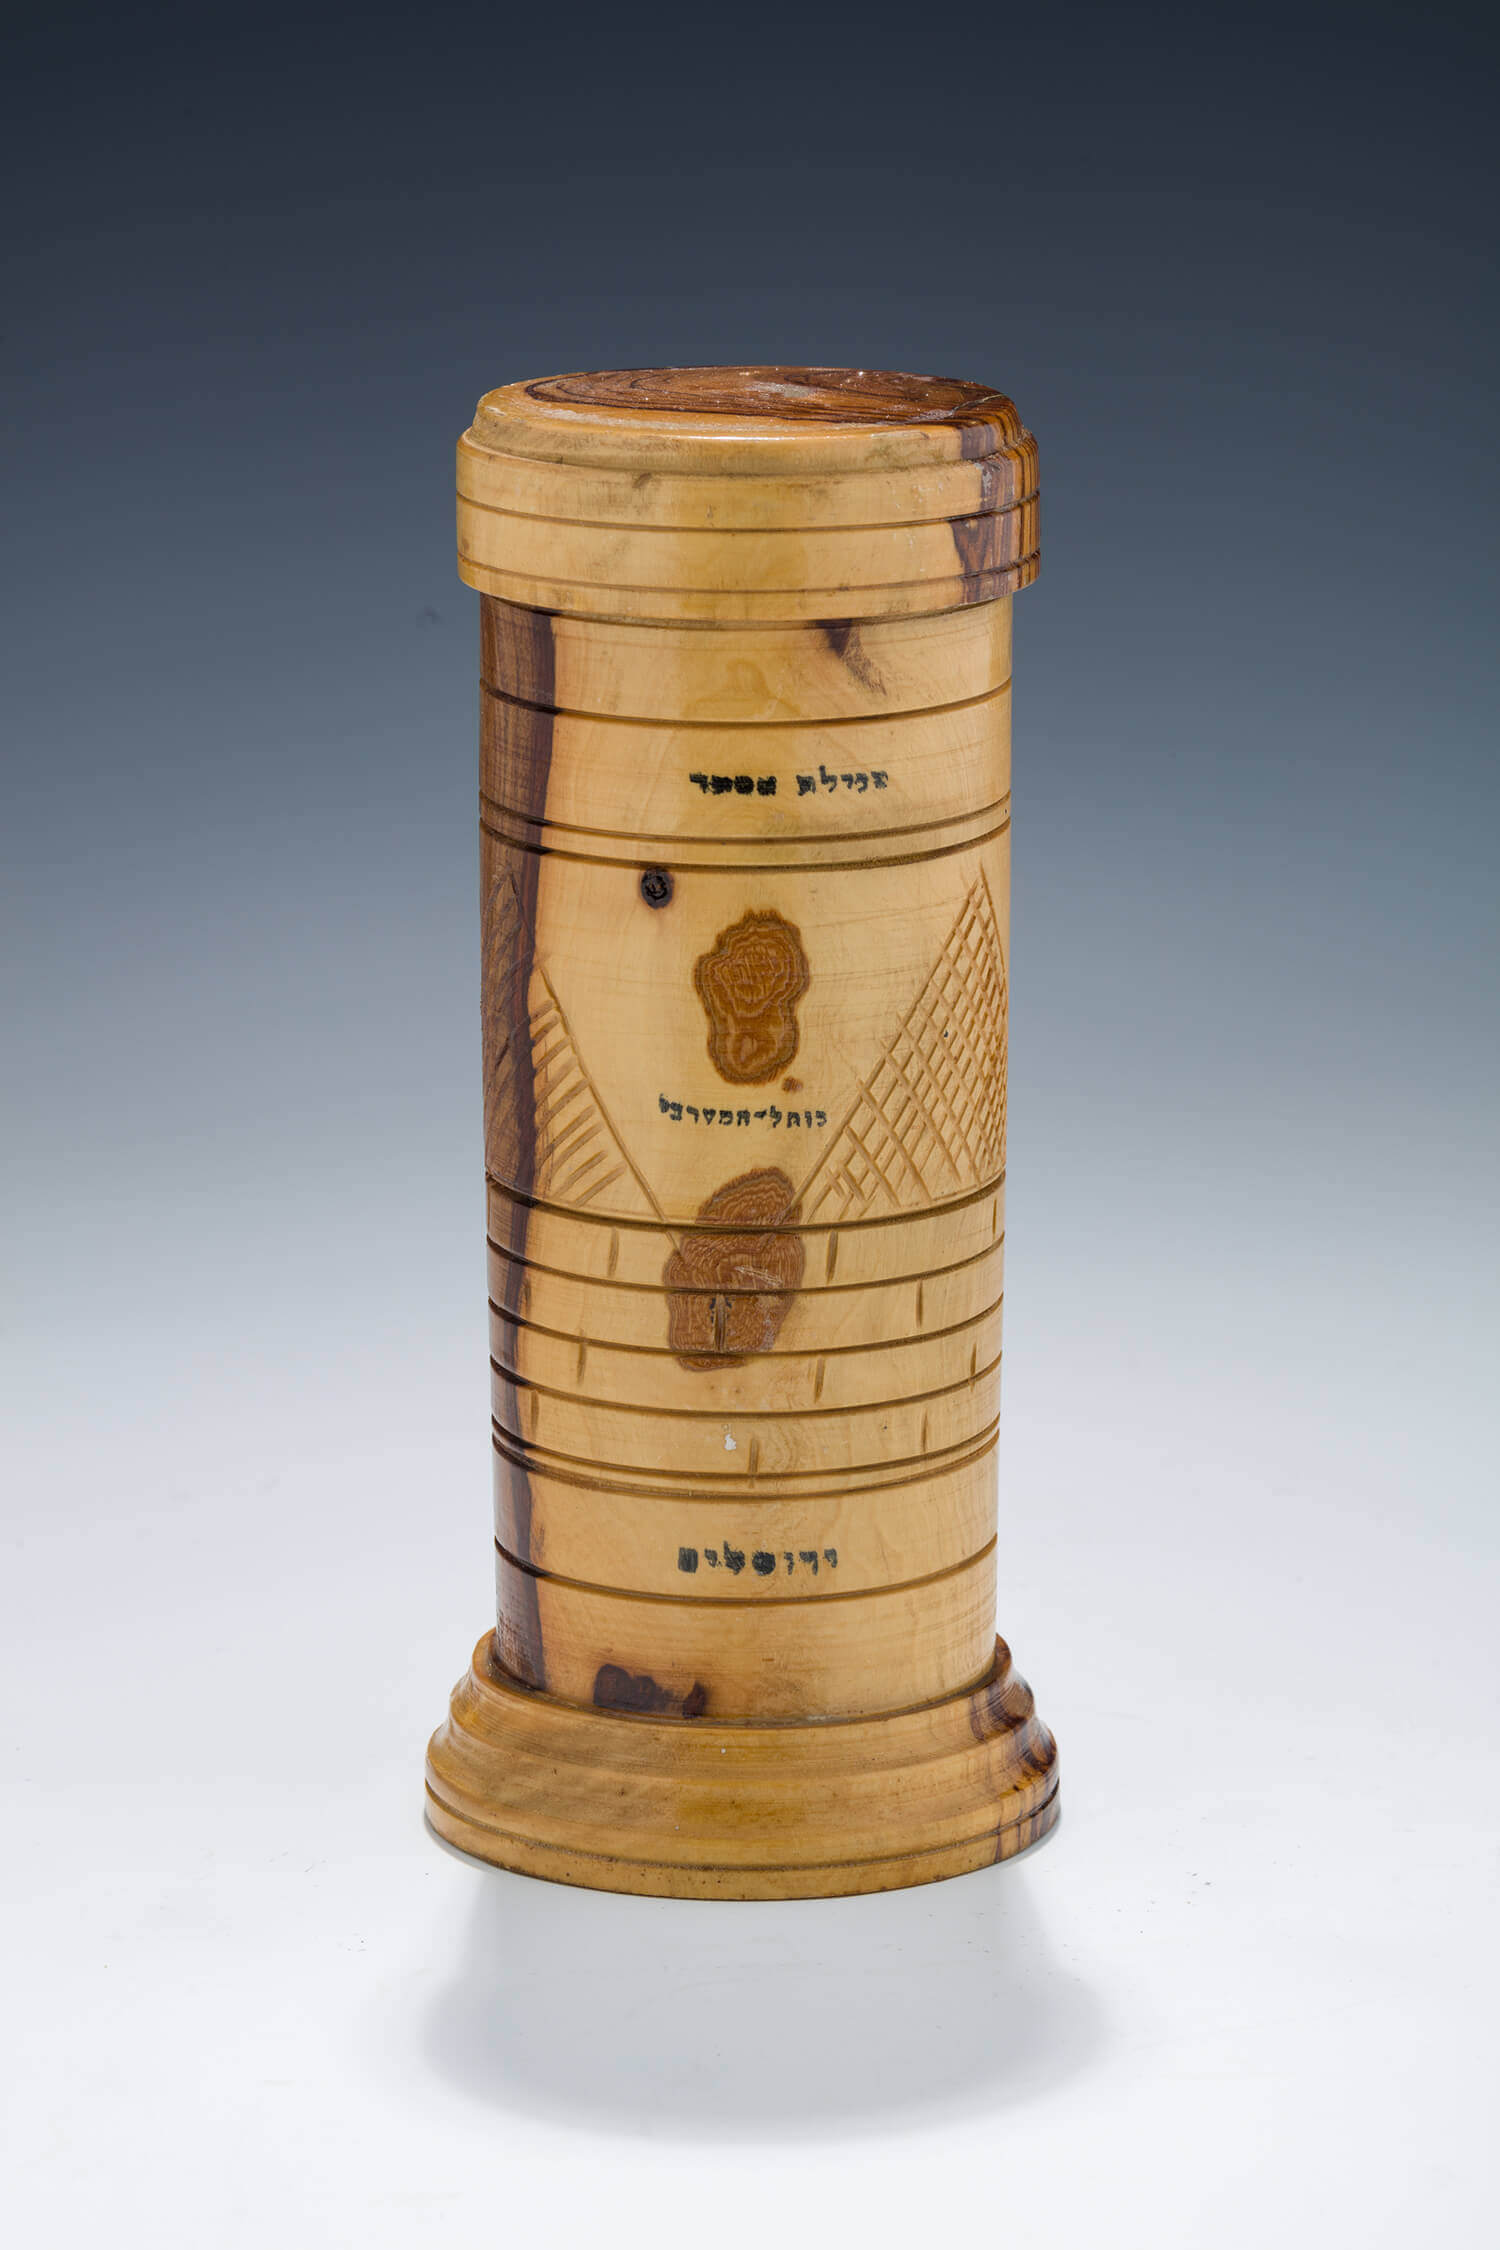 100. A VINTAGE OLIVEWOOD MEGILLAH CASE WITH GRA STYLE MEGILLAH